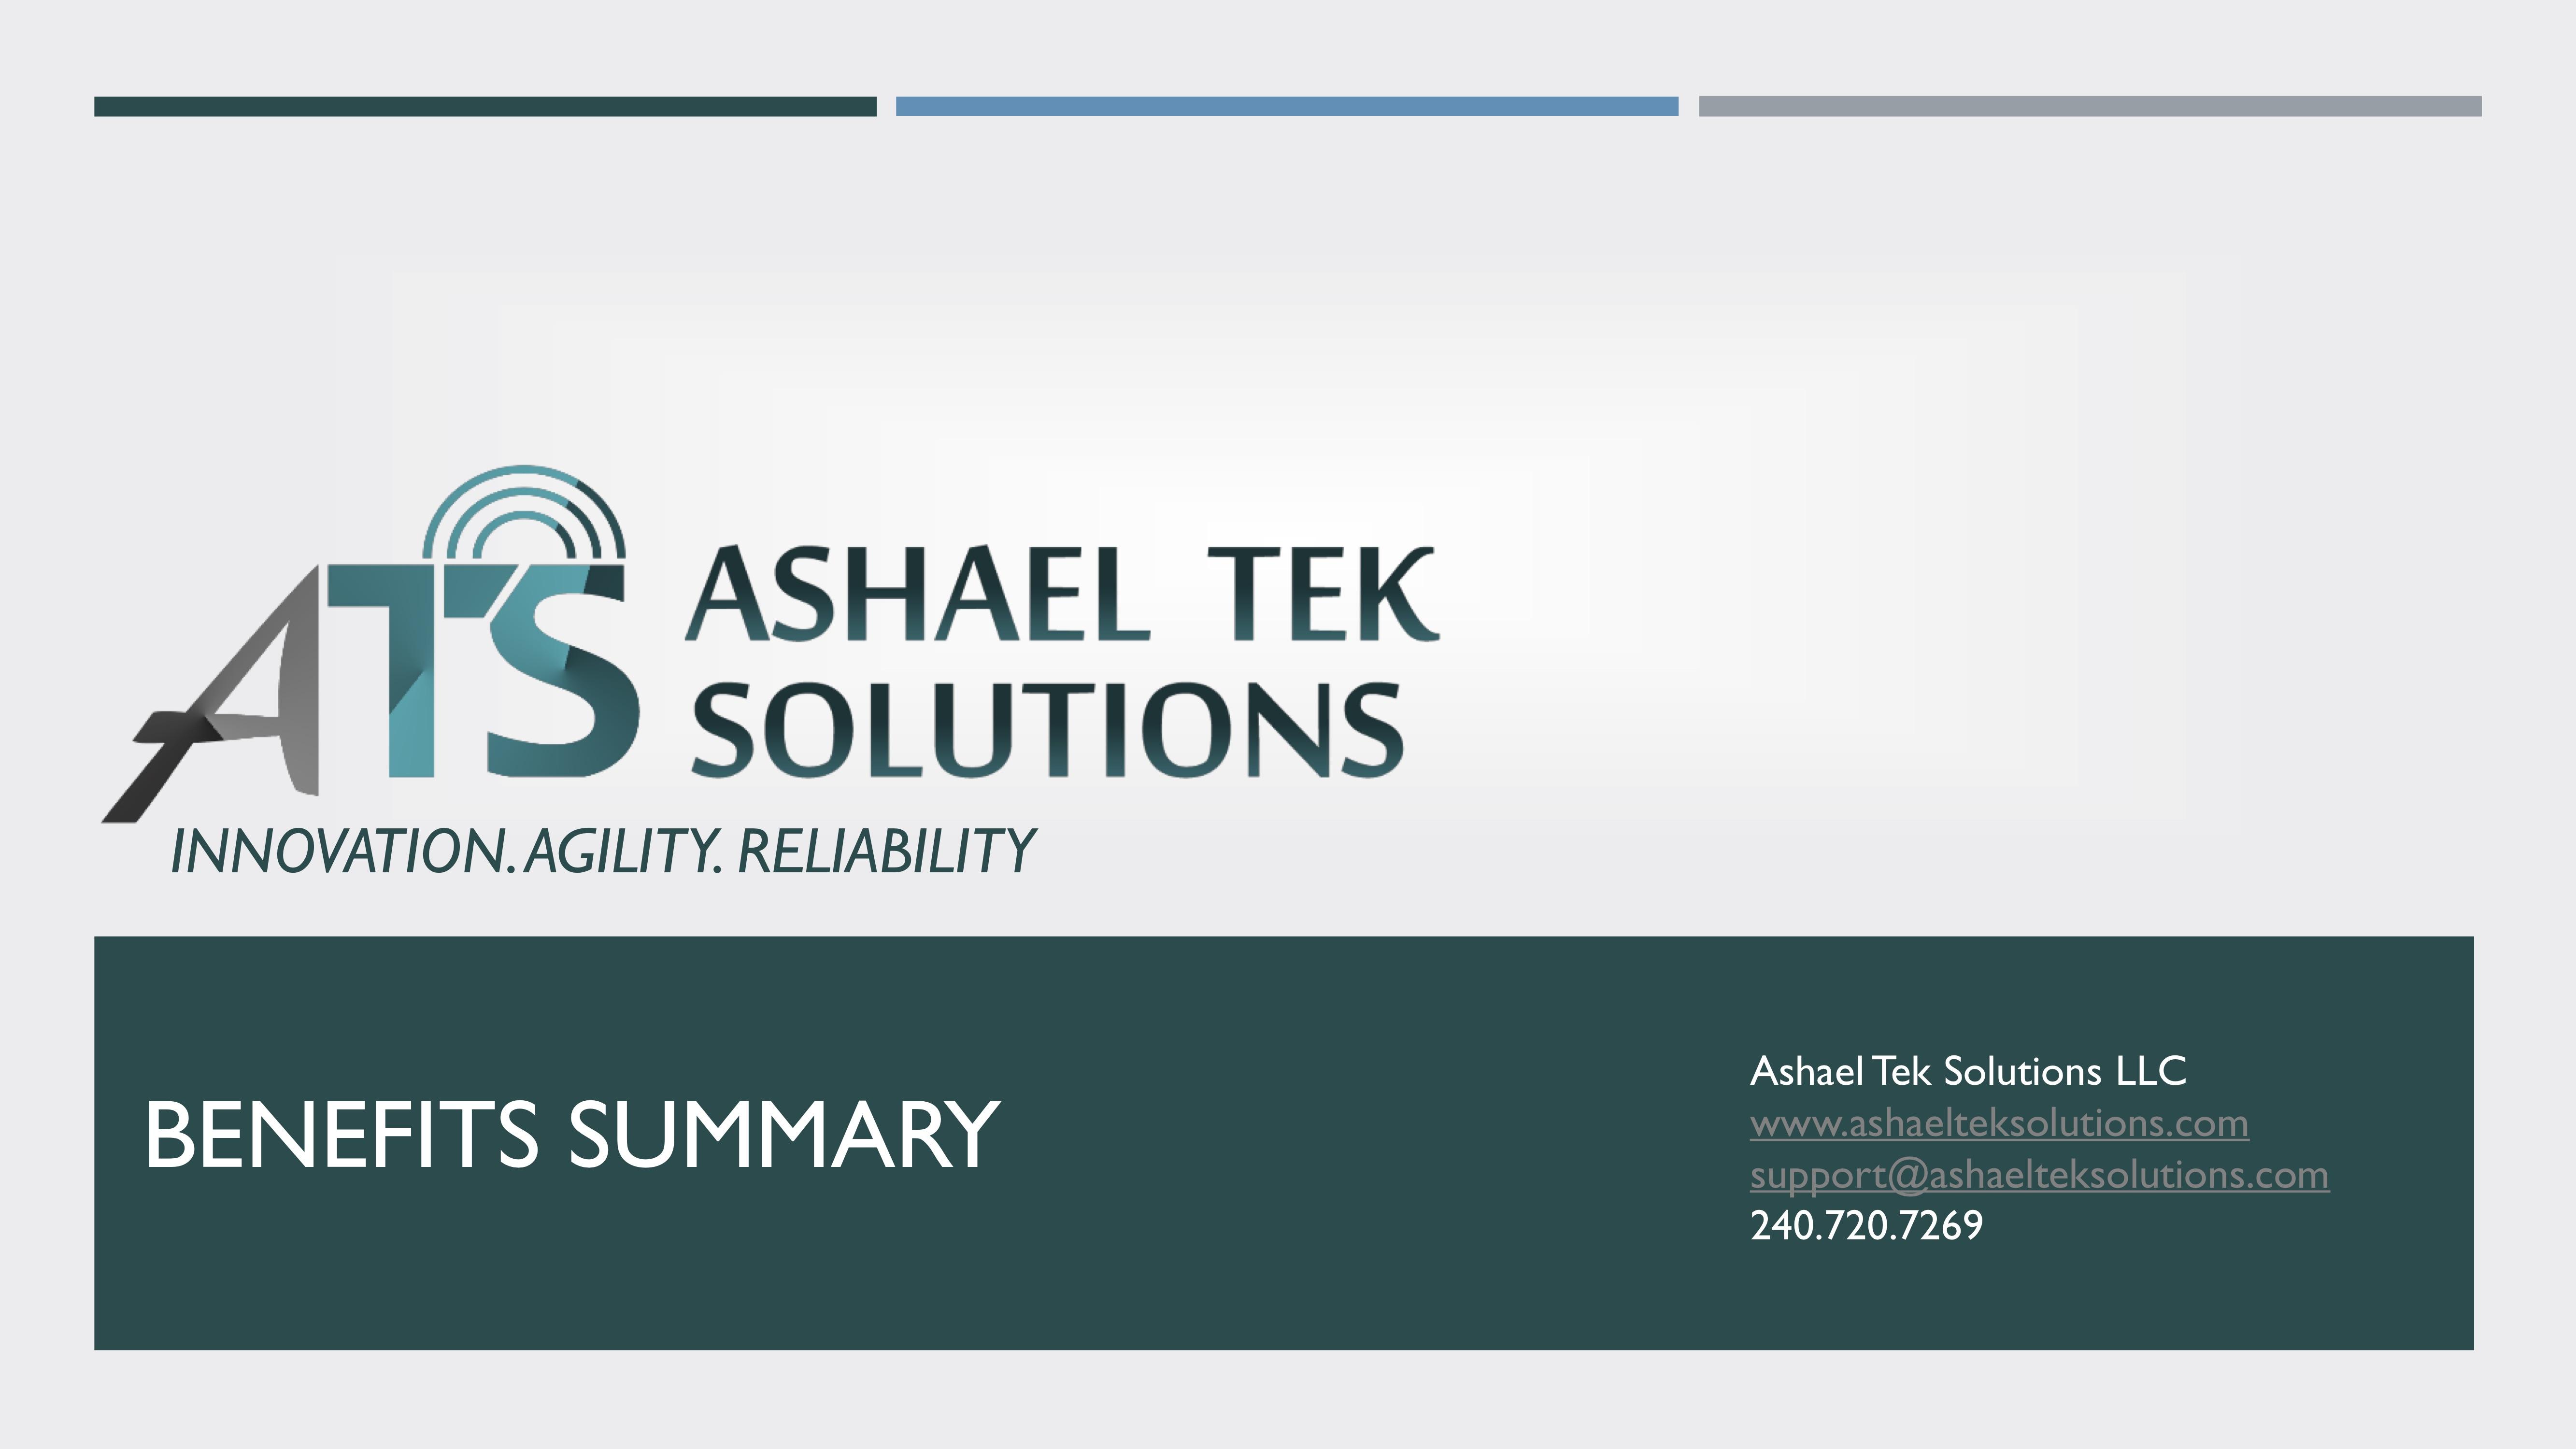 Ashael Tek Benefits Summary 2019